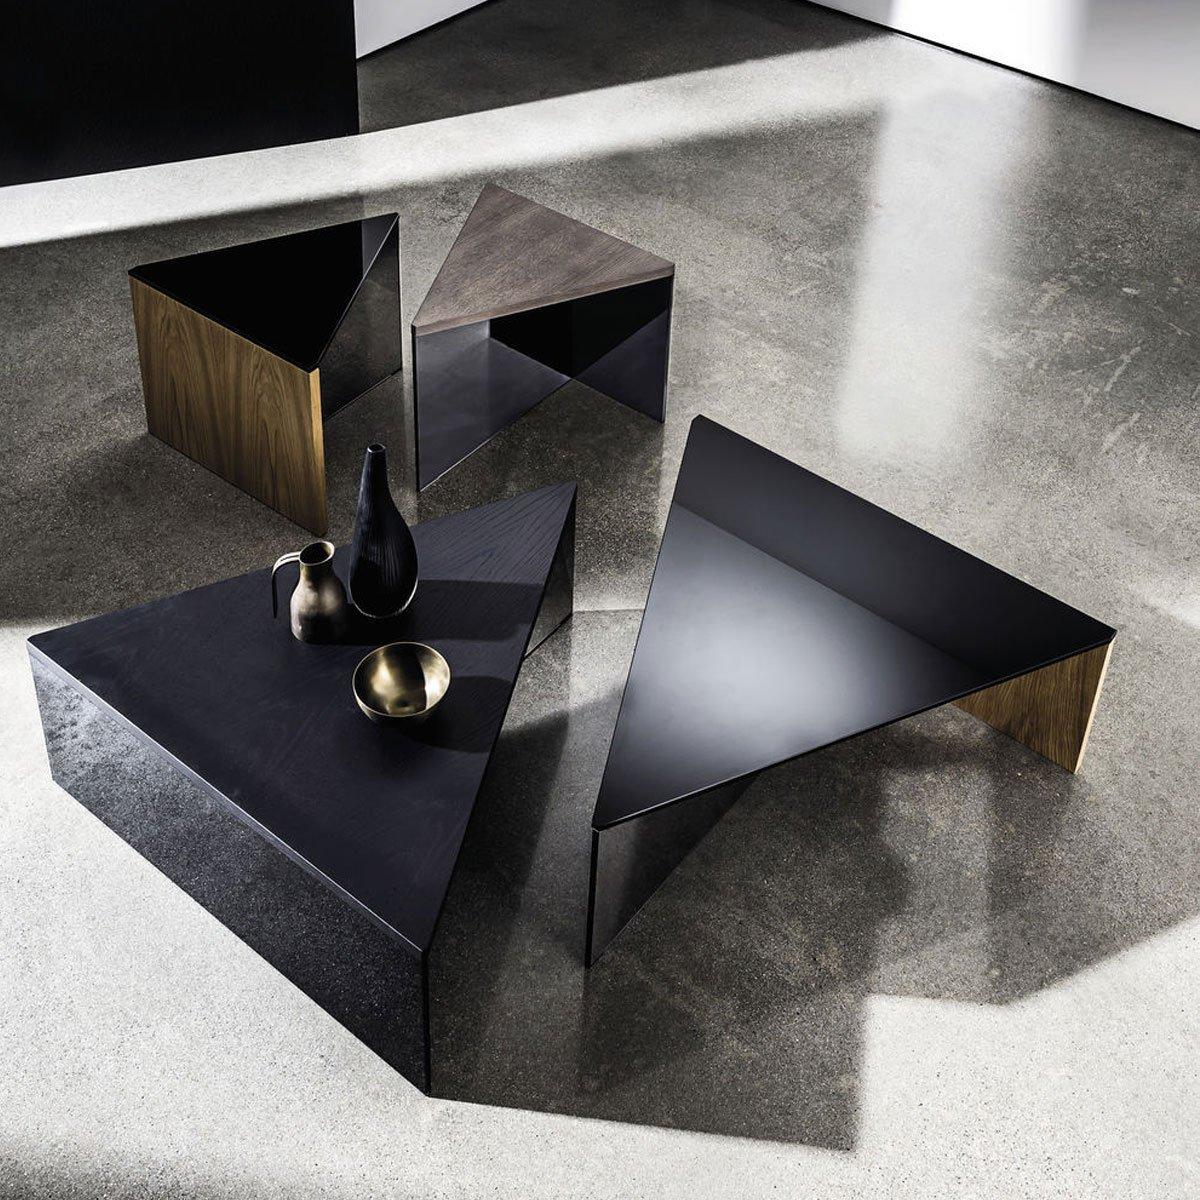 Regolo Triangular Glass and Wood Coffee Table